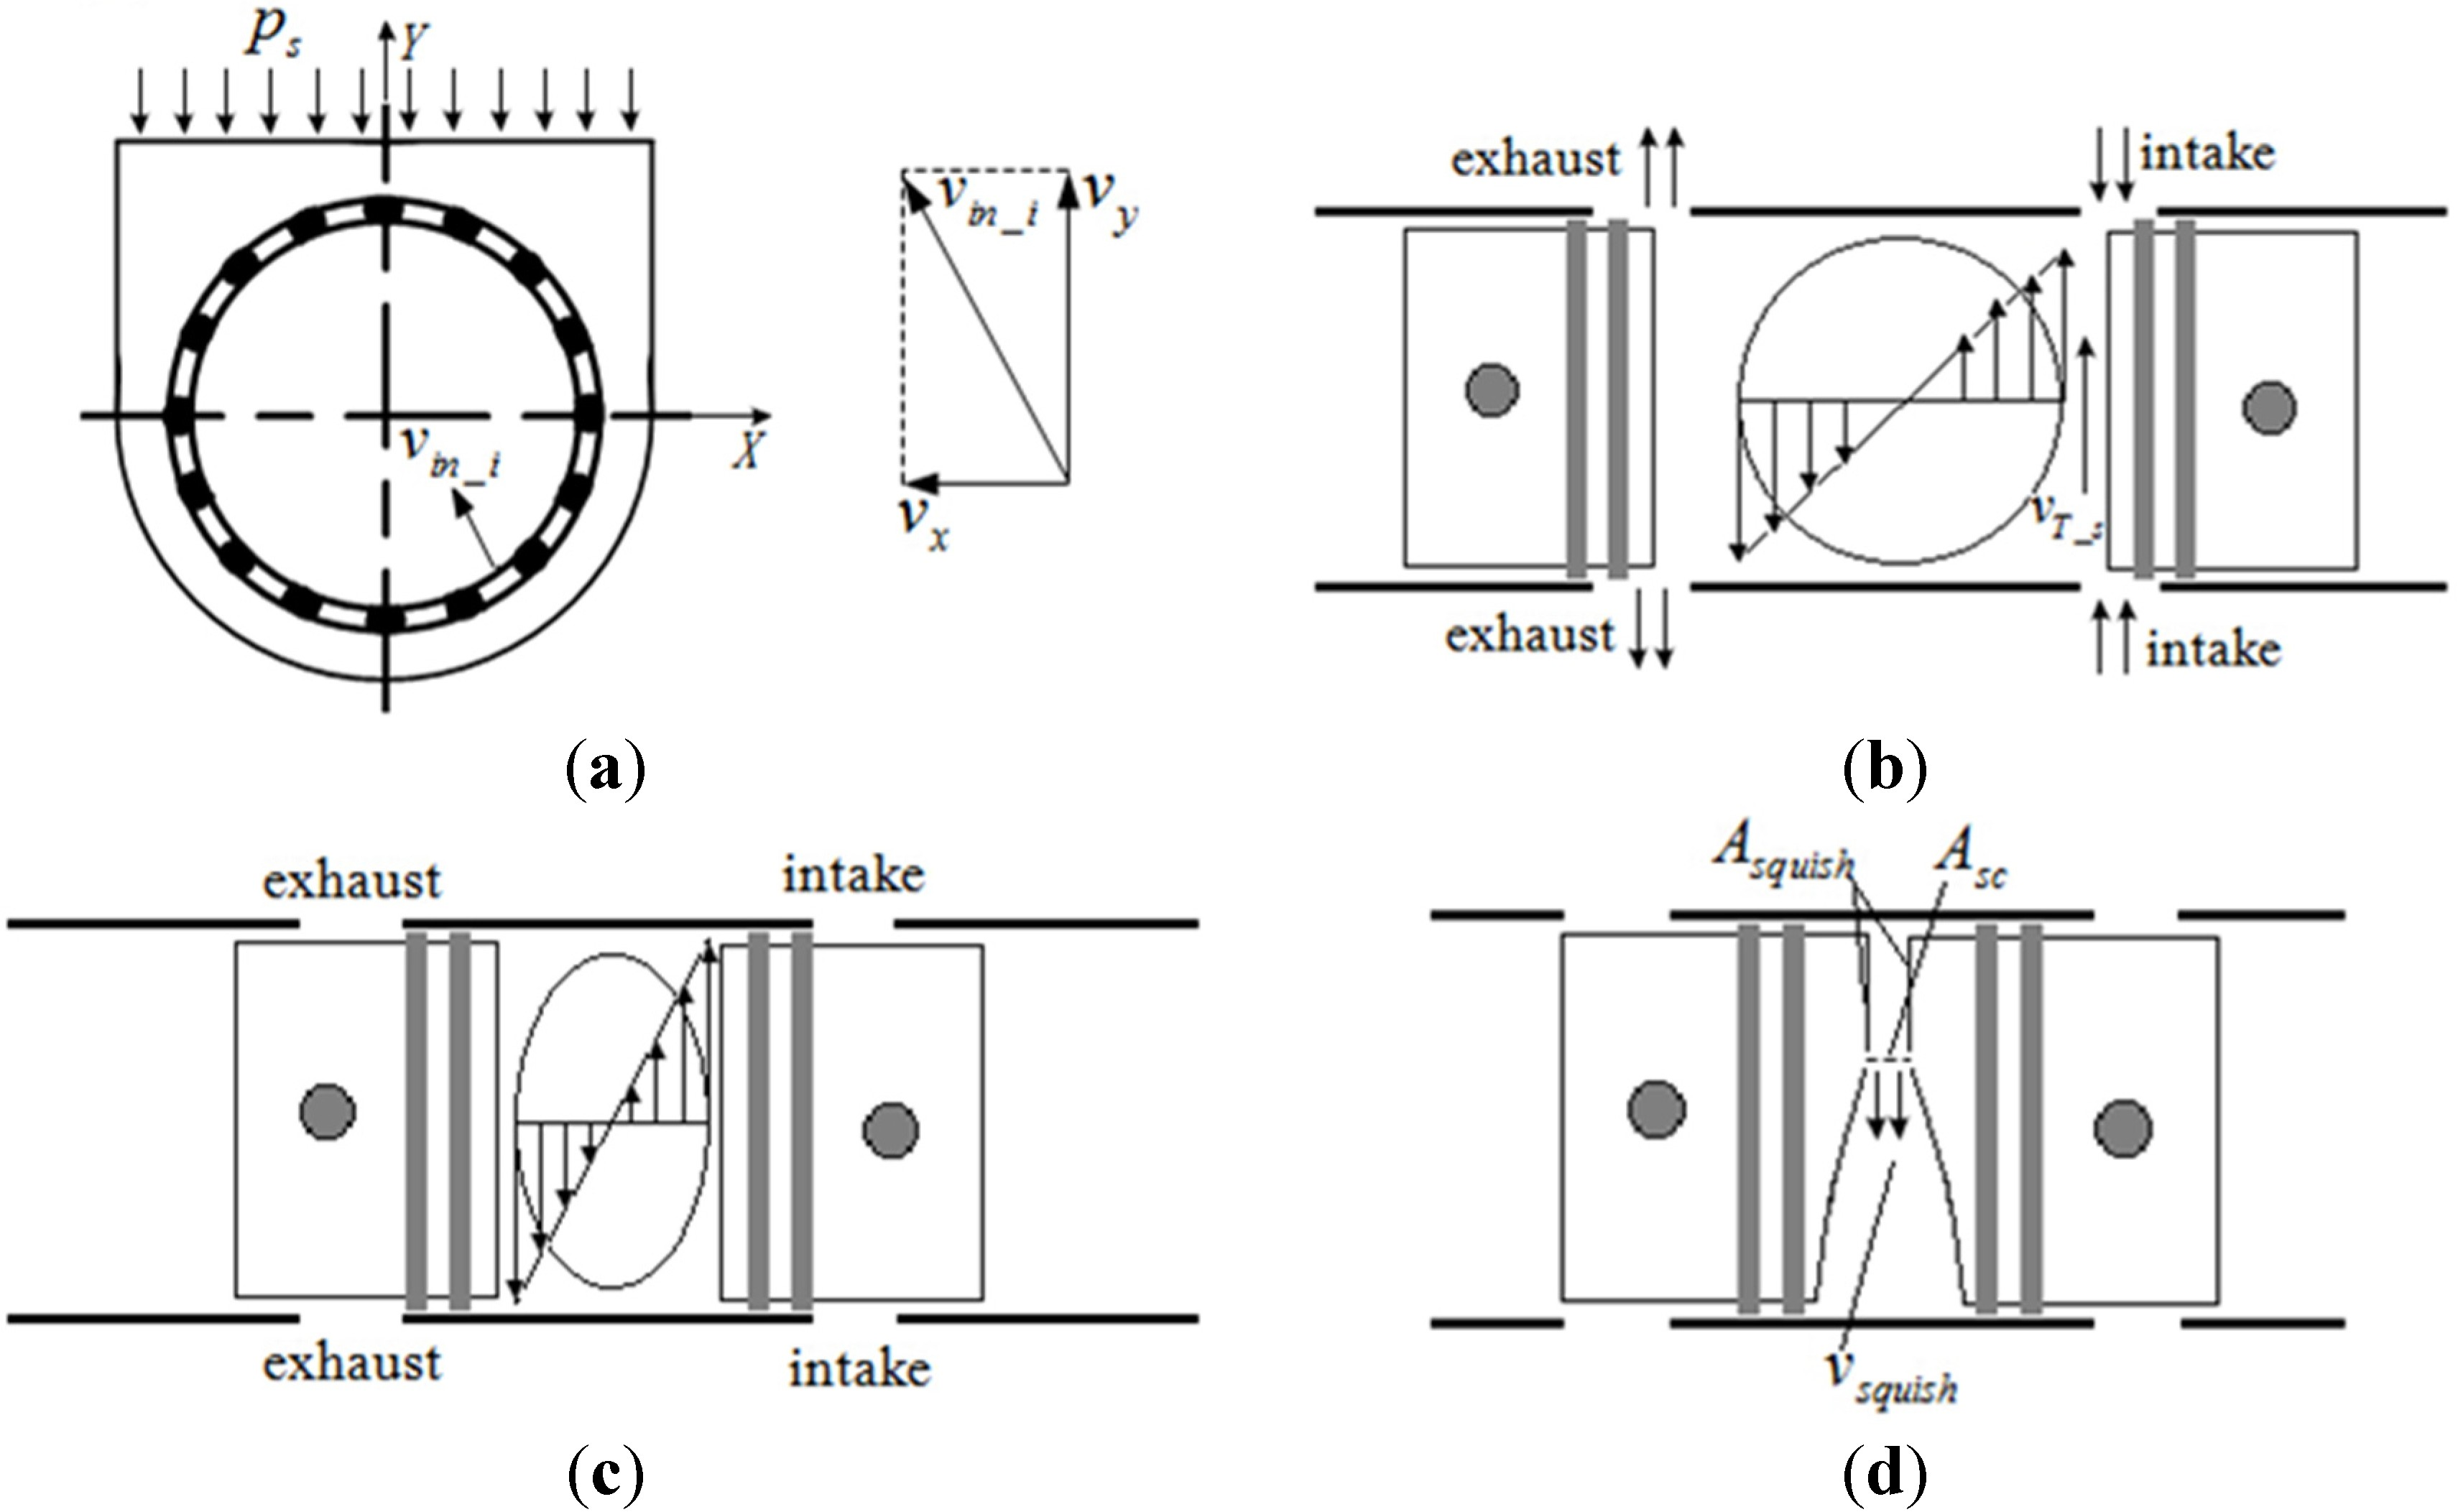 Engine Cylinder Diagram Energies Free Full Text Of Engine Cylinder Diagram